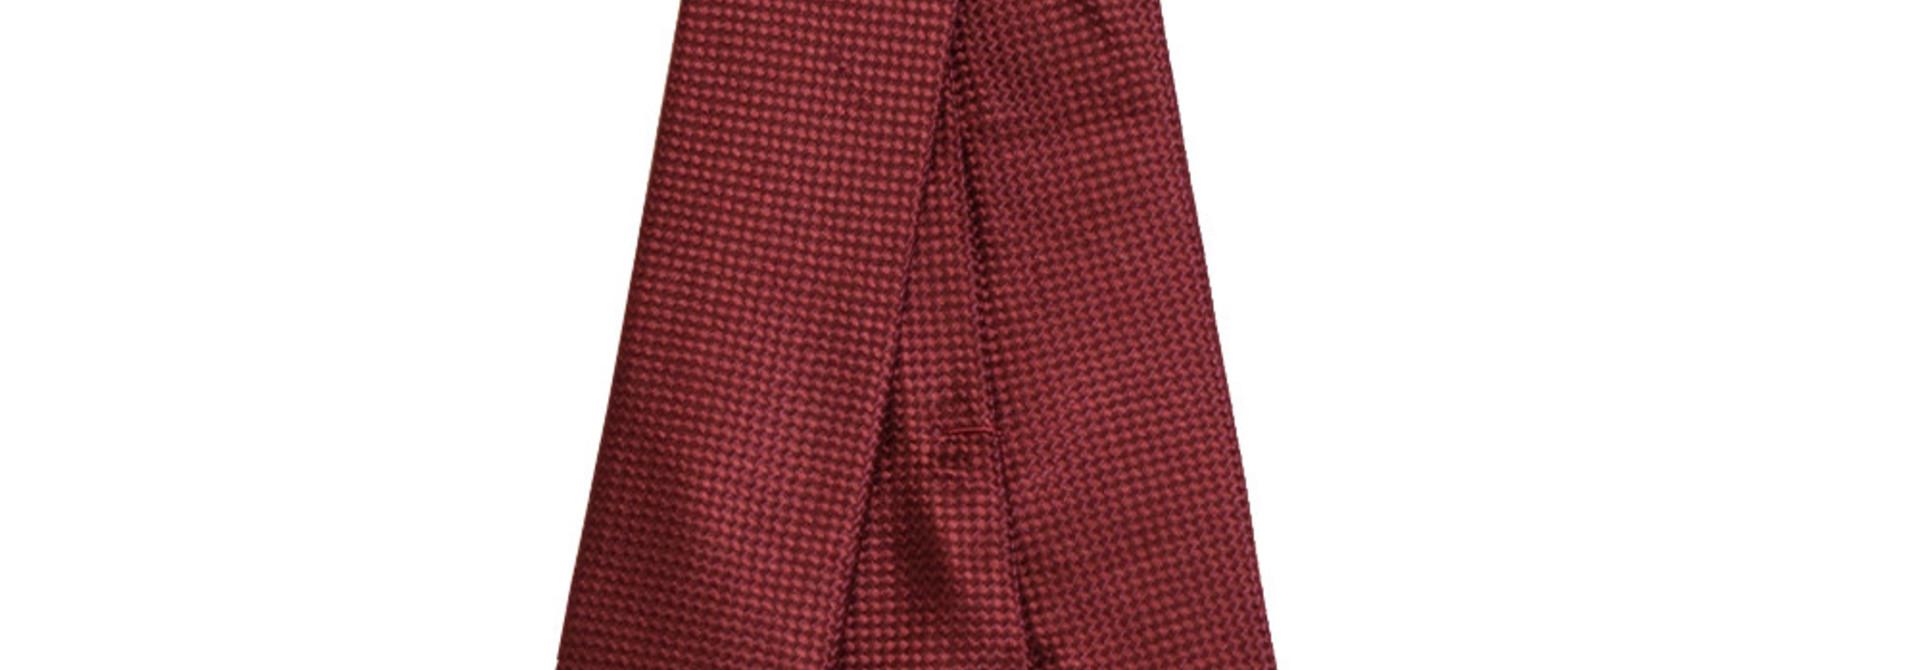 Maroon 'Slim' Necktie